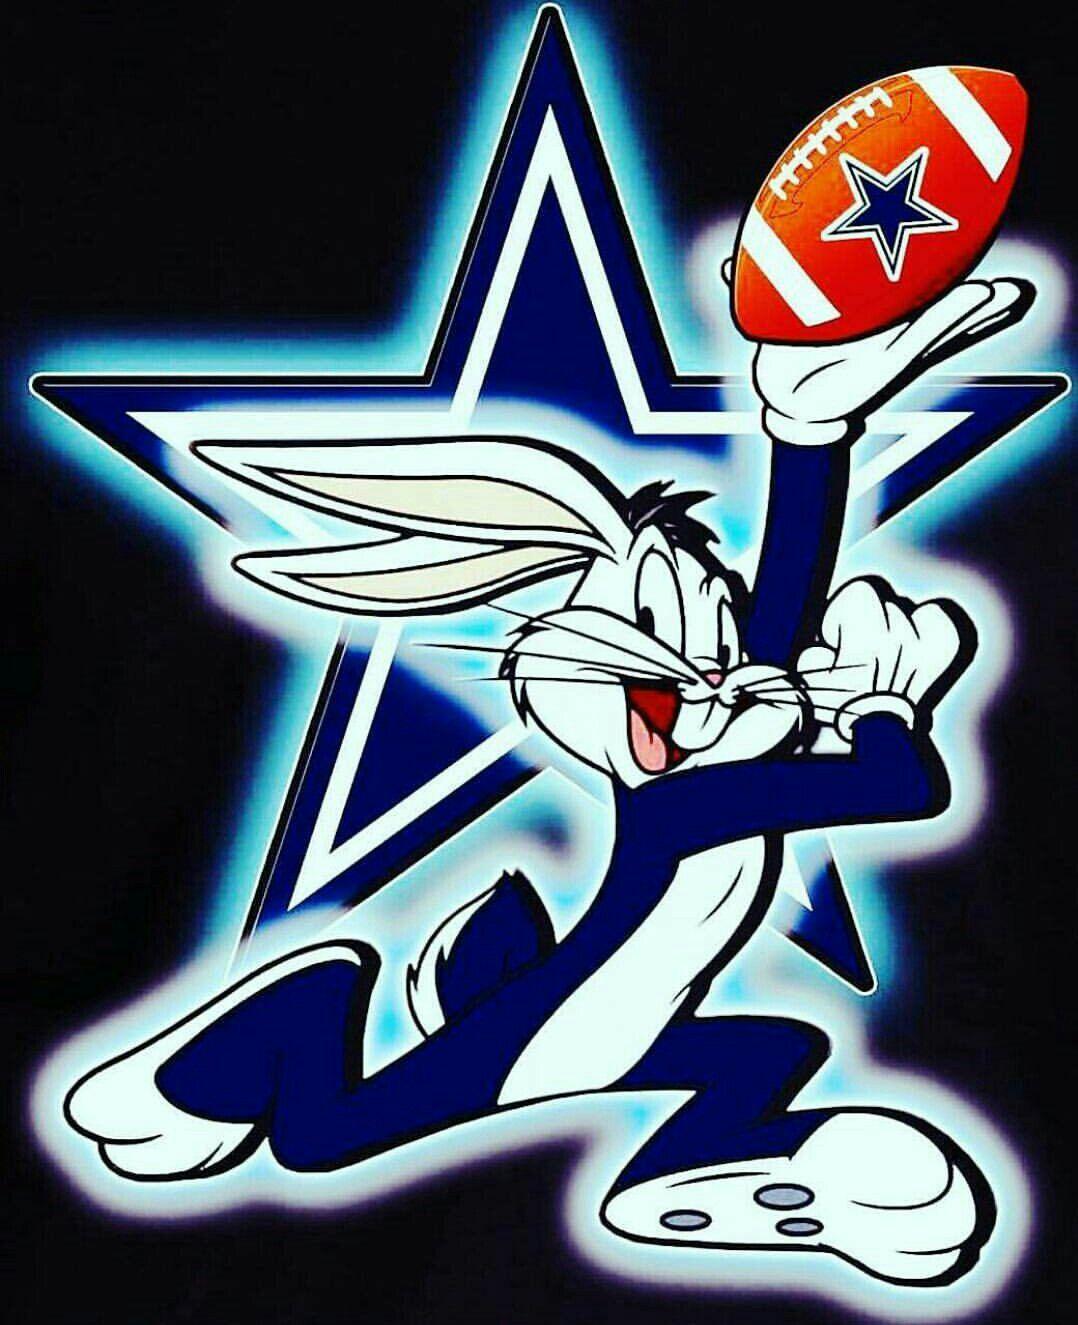 Bugs Bunny/America's Team